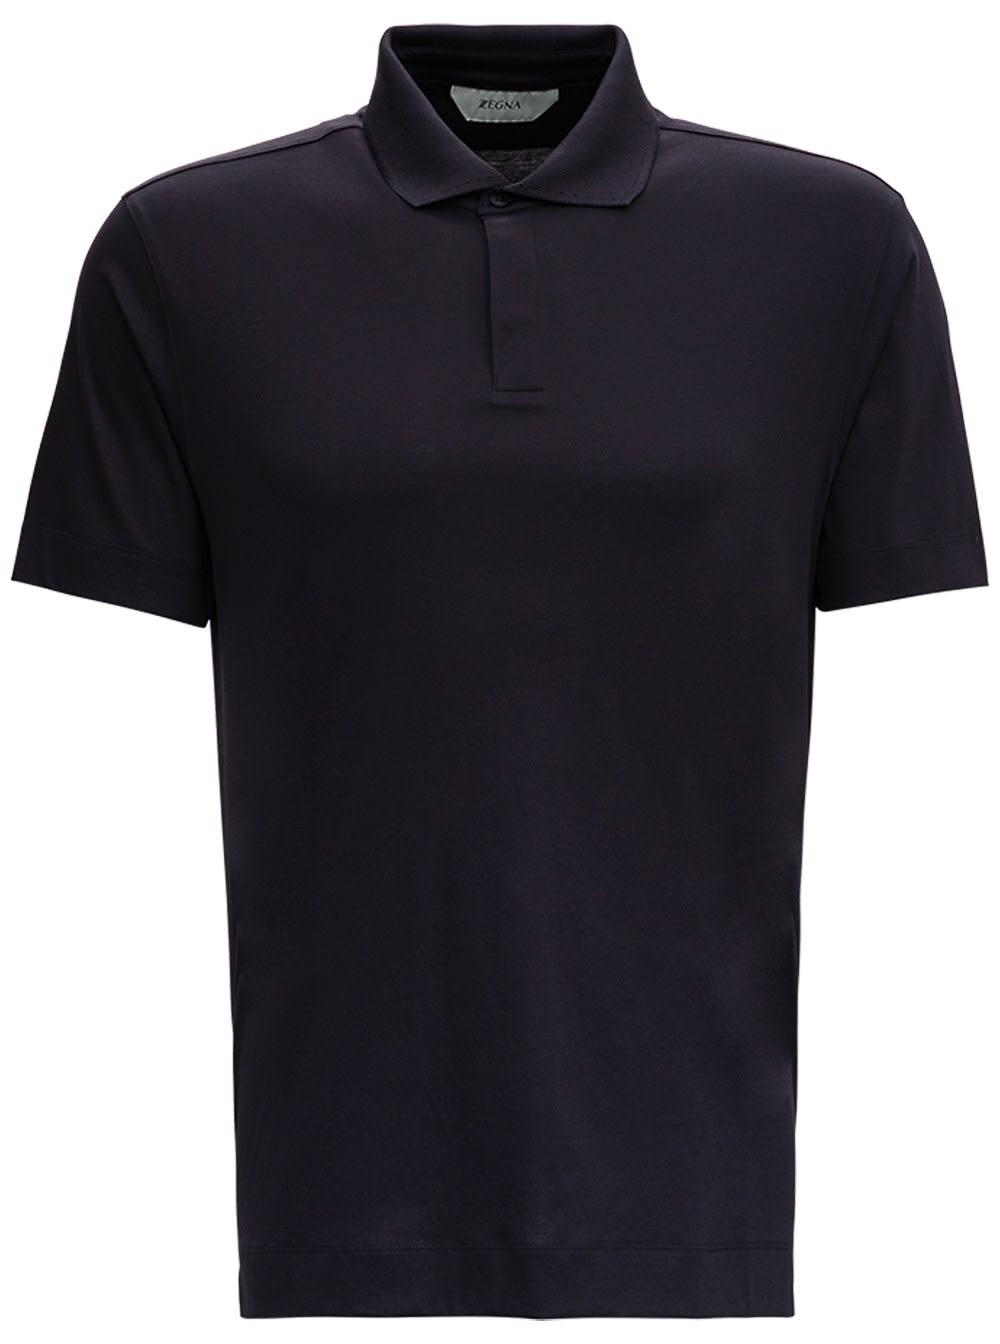 Z Zegna Blue Basic Cotton Polo Shirt